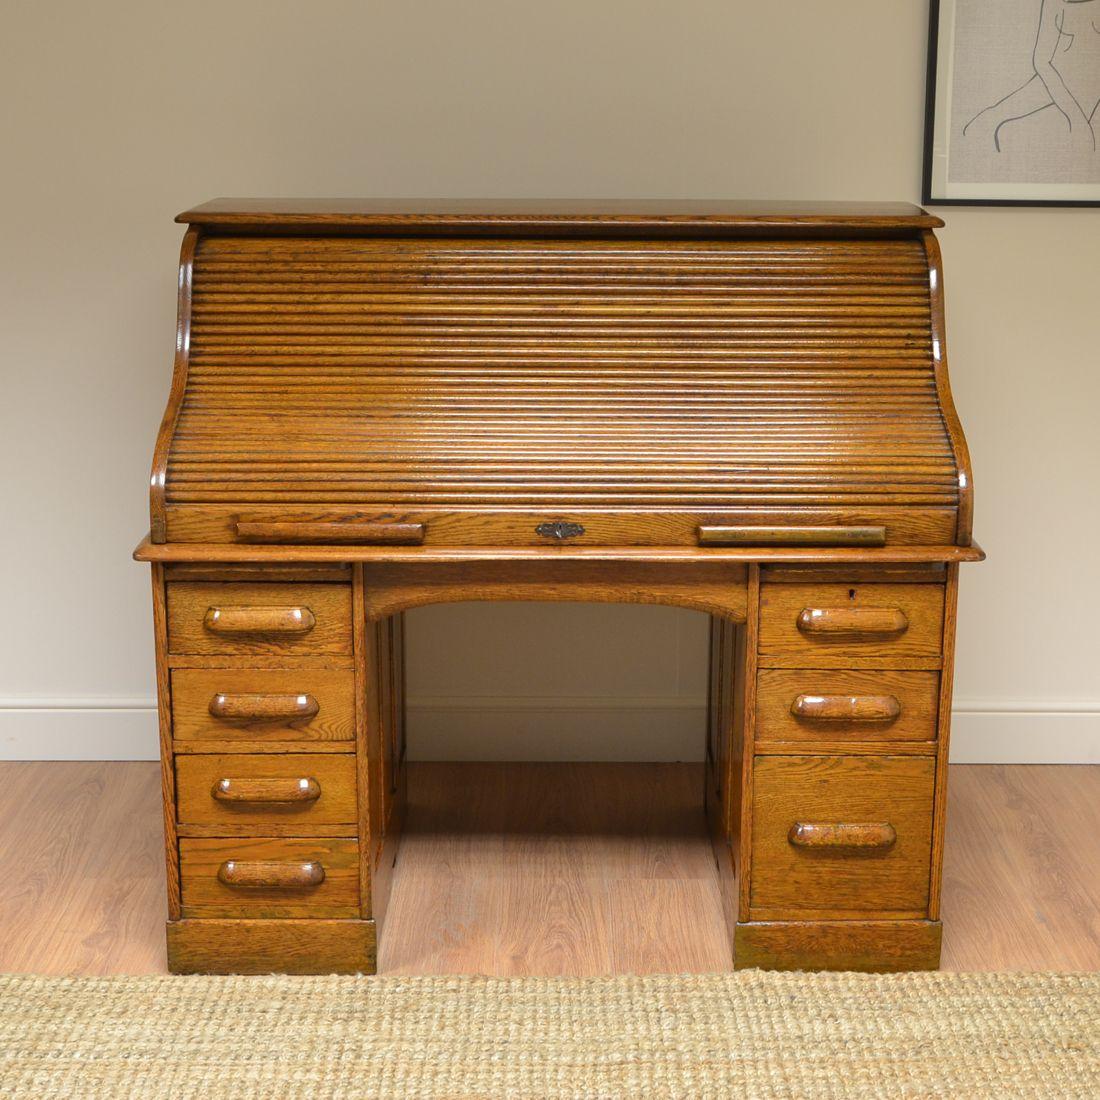 Quality Golden Oak Edwardian Antique Roll Top Desk Antique Desk Desk Golden Oak